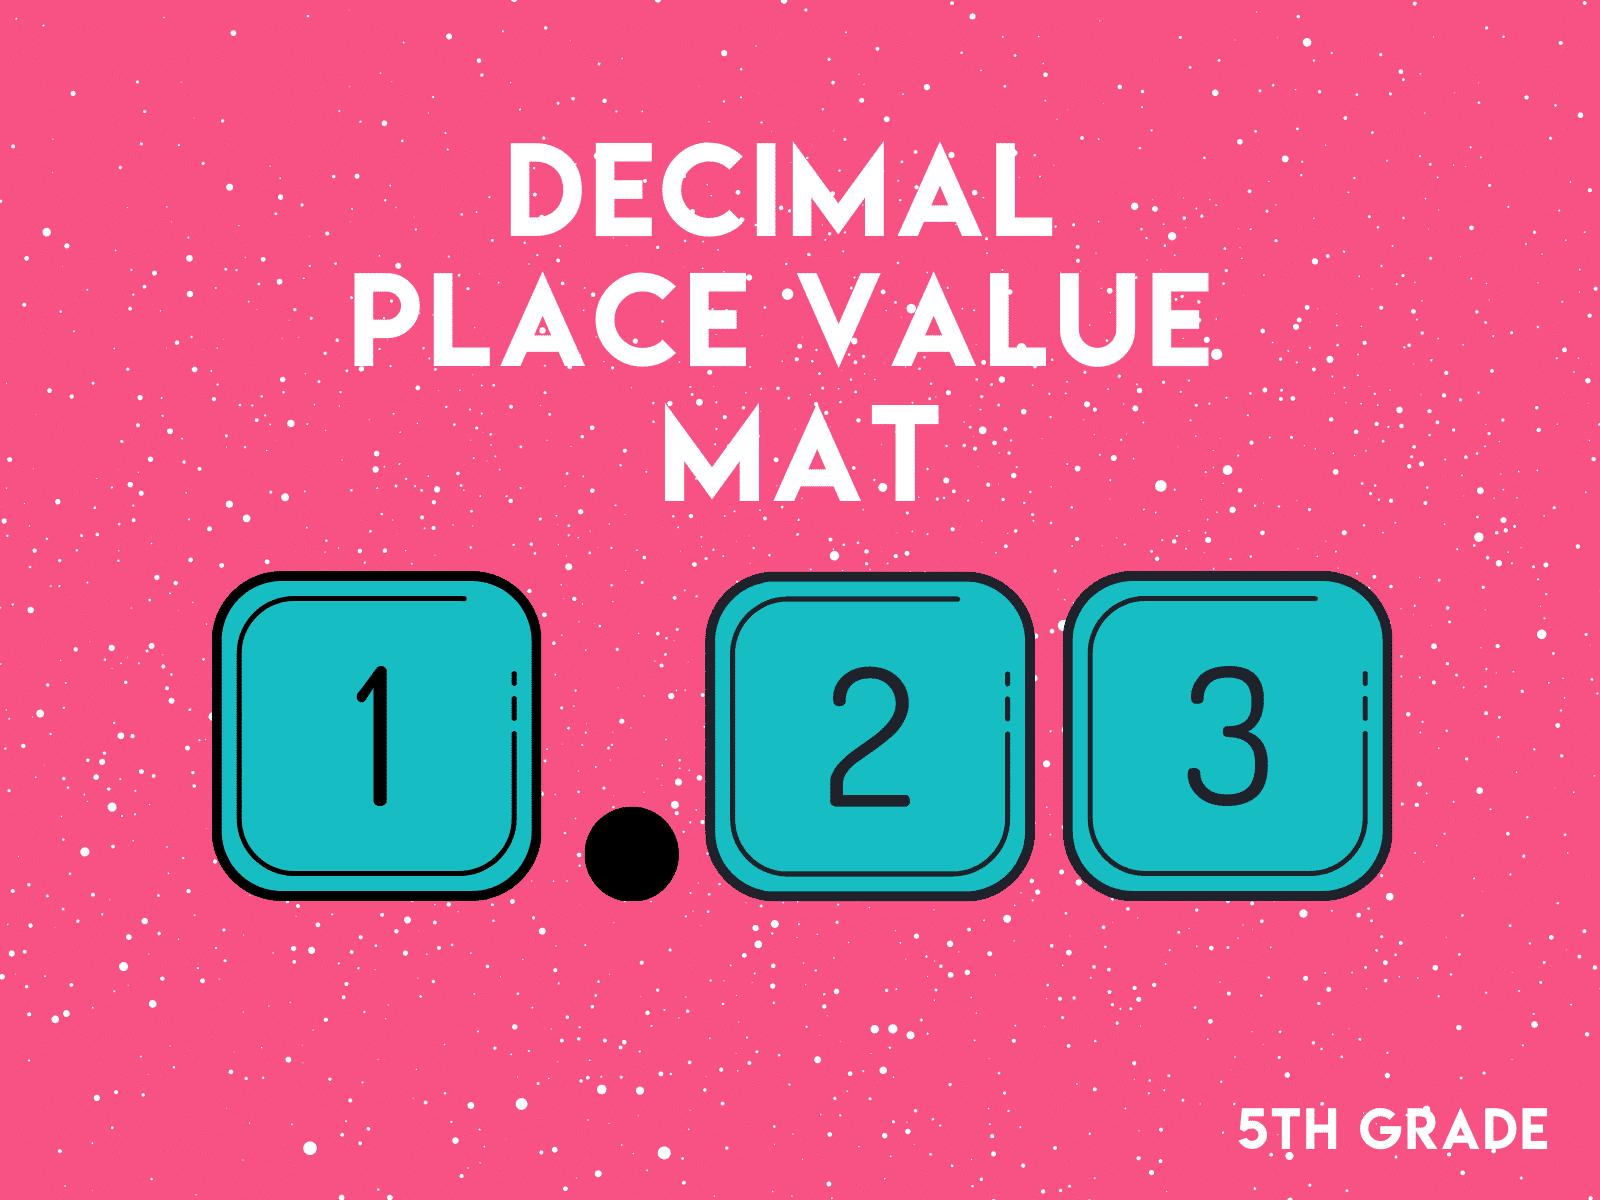 Decimal Place Value Mat   5th Grade Math Worksheet